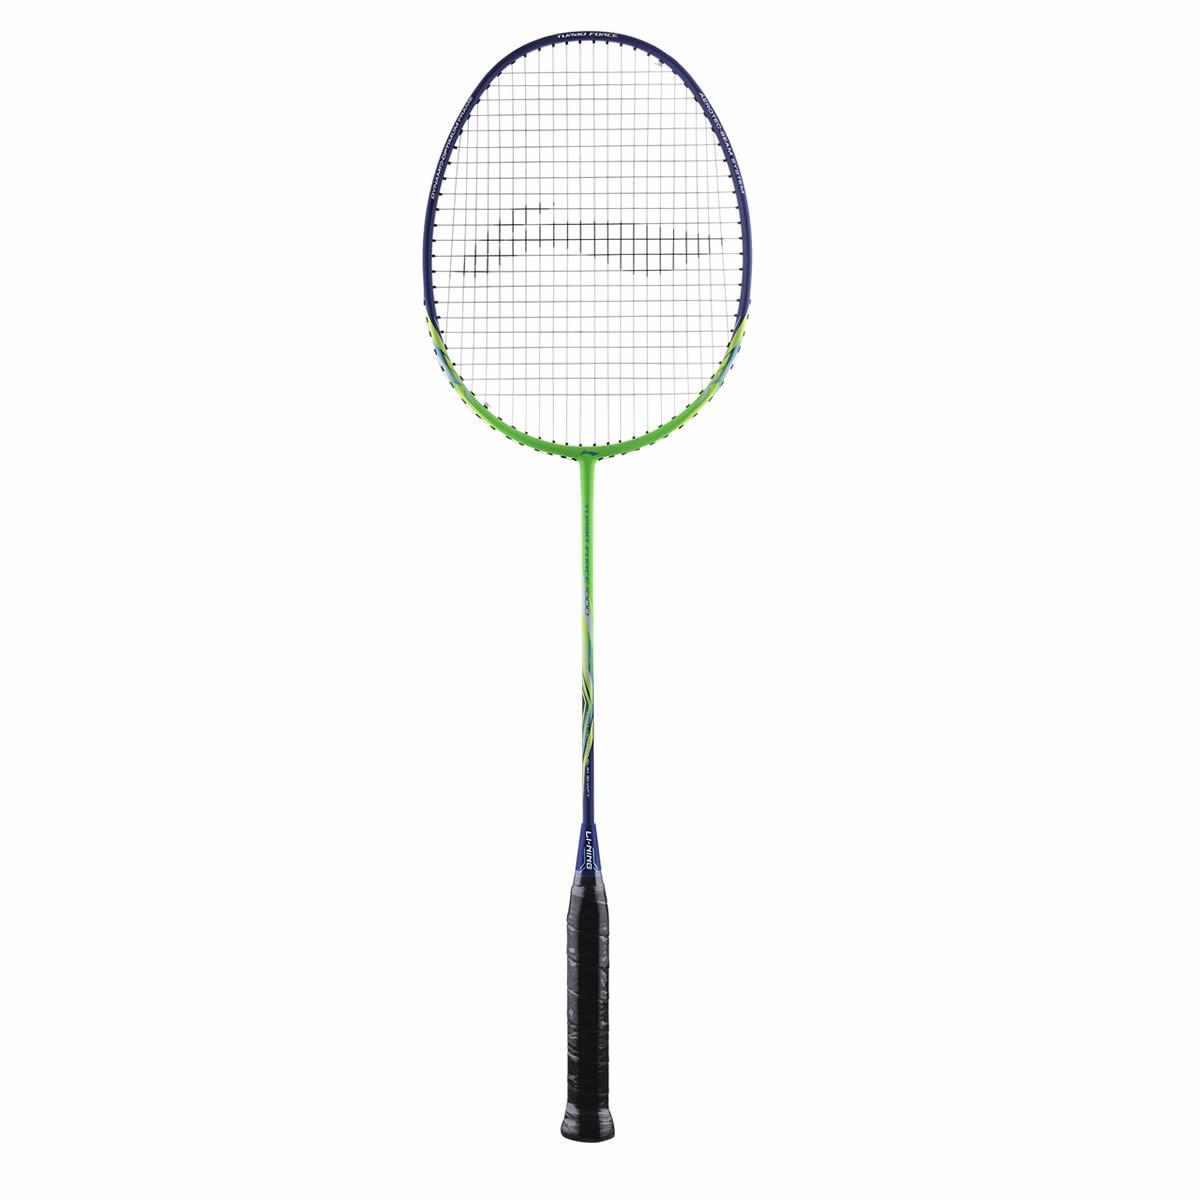 LI NING Turbo Force 1000 Badmintonschläger mit Thermohülle Thermohülle Thermohülle besaitet 2019 -NEU- cb544b